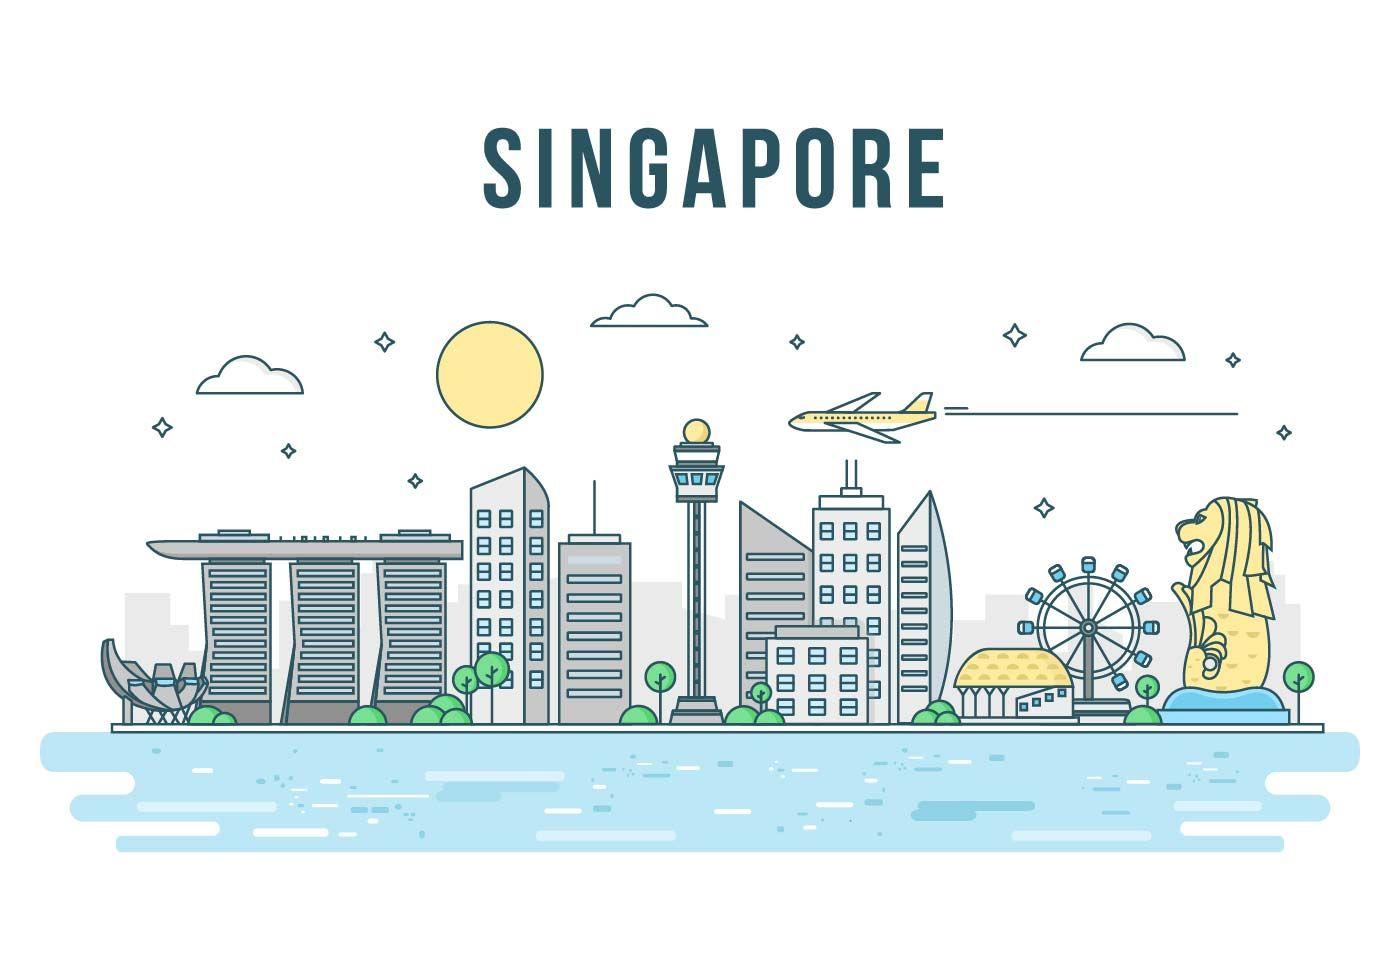 Free Merlion And Singapore Landmark Vector Singapore Art Singapore Map Singapore National Day